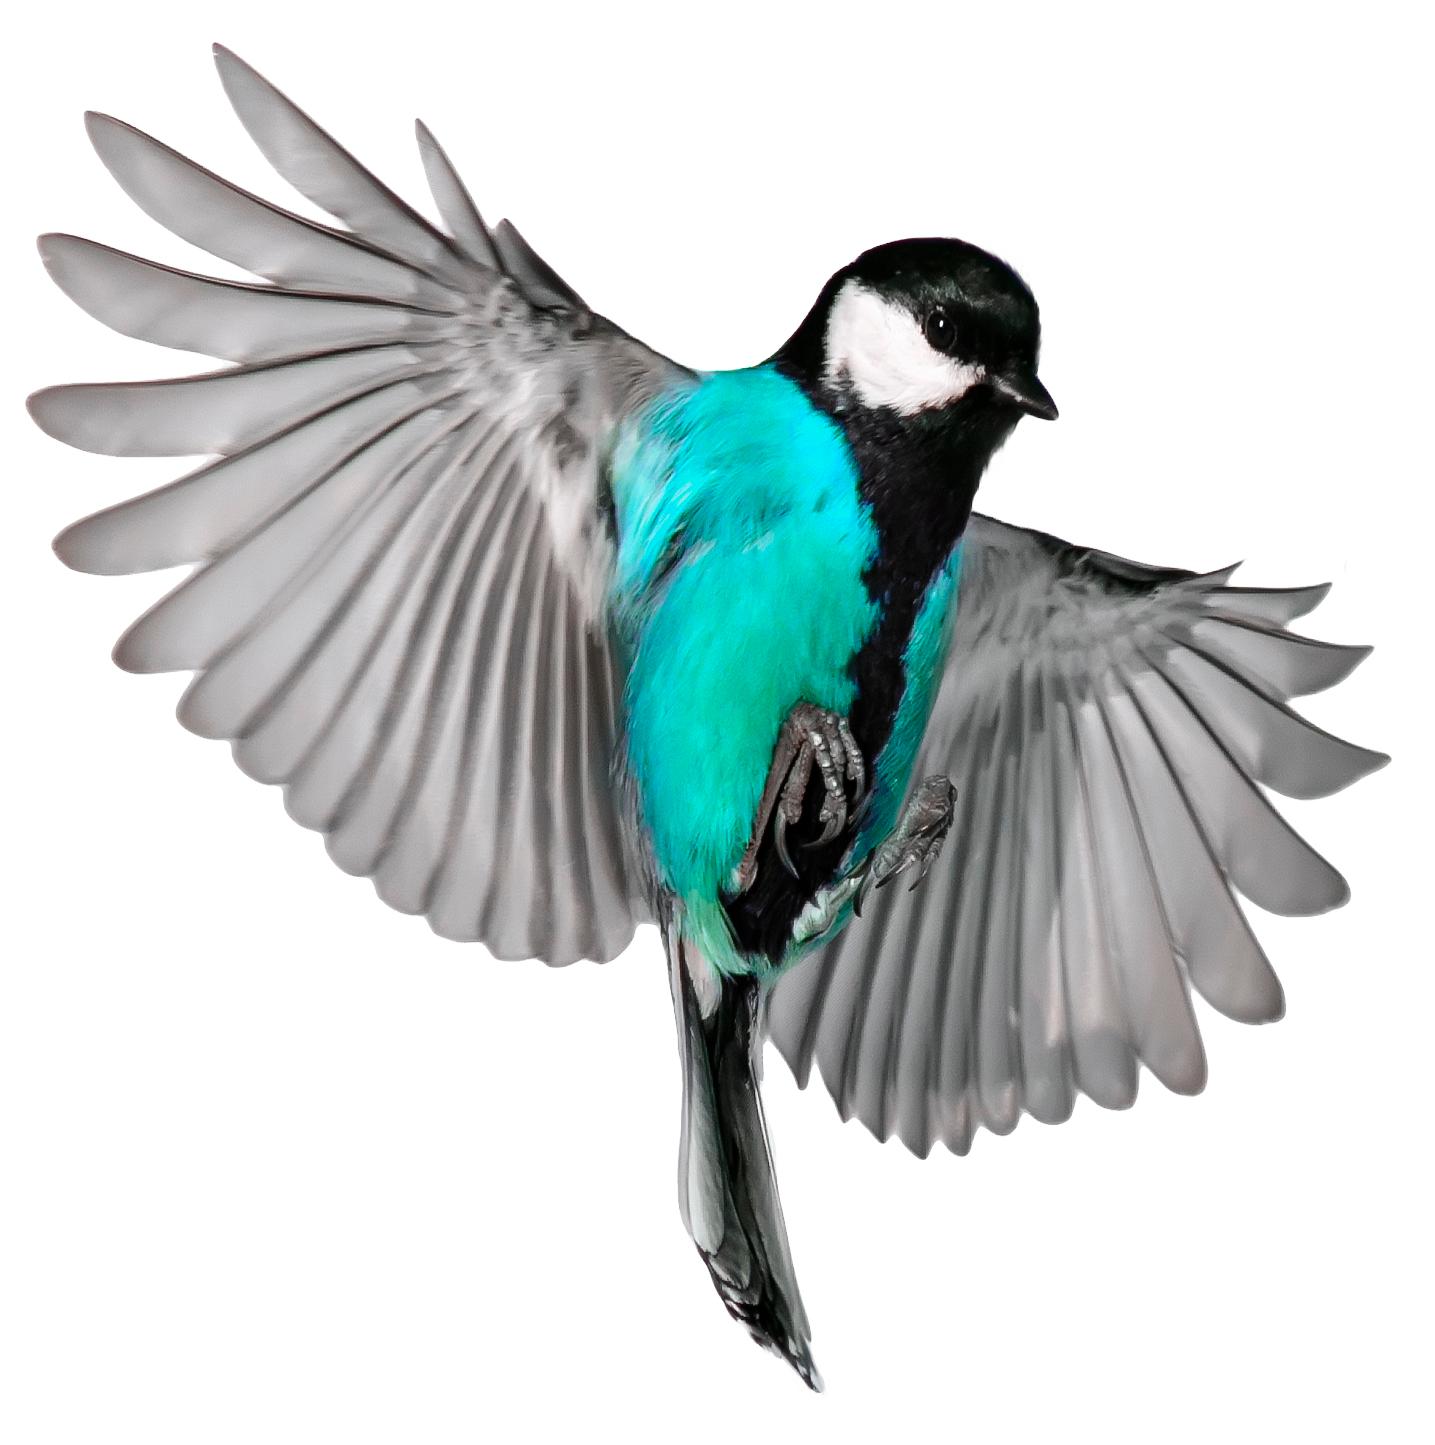 Image of bird in flight